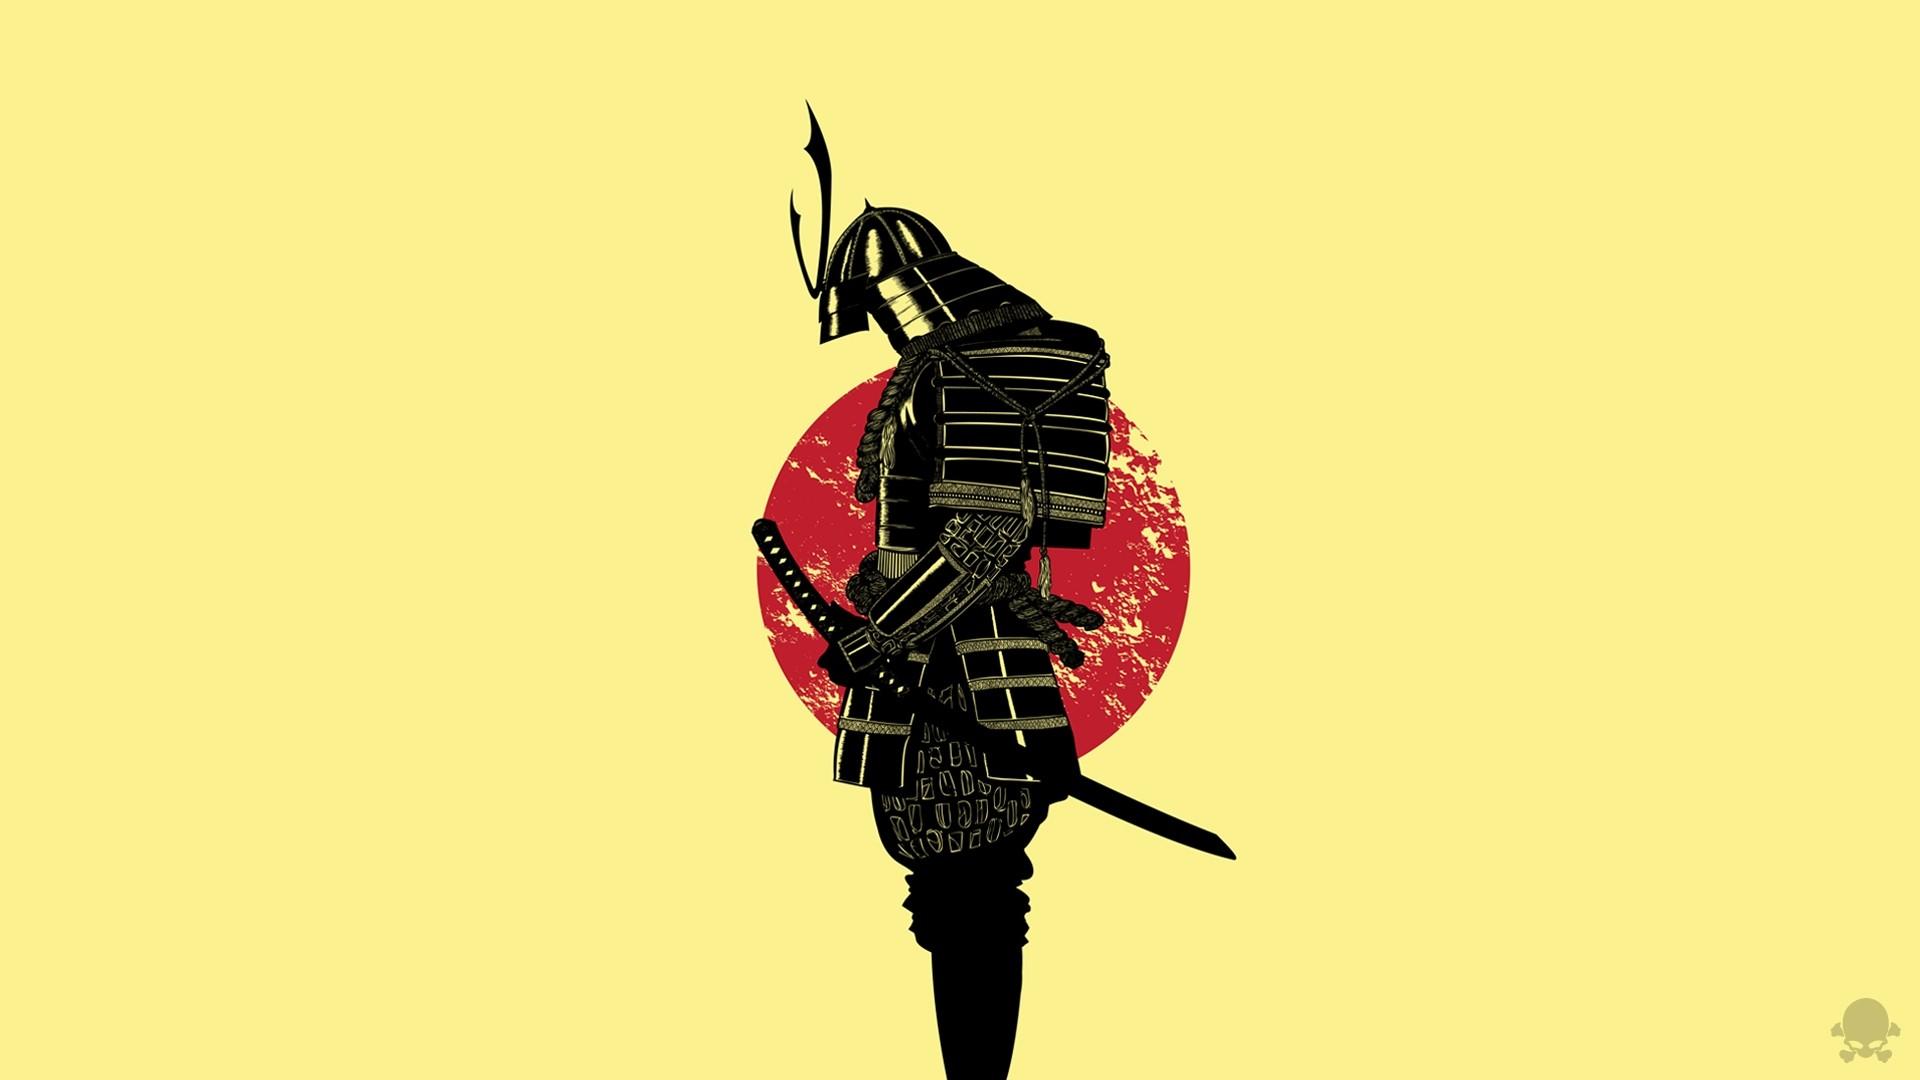 30 samurai wallpapers hd - photo #16